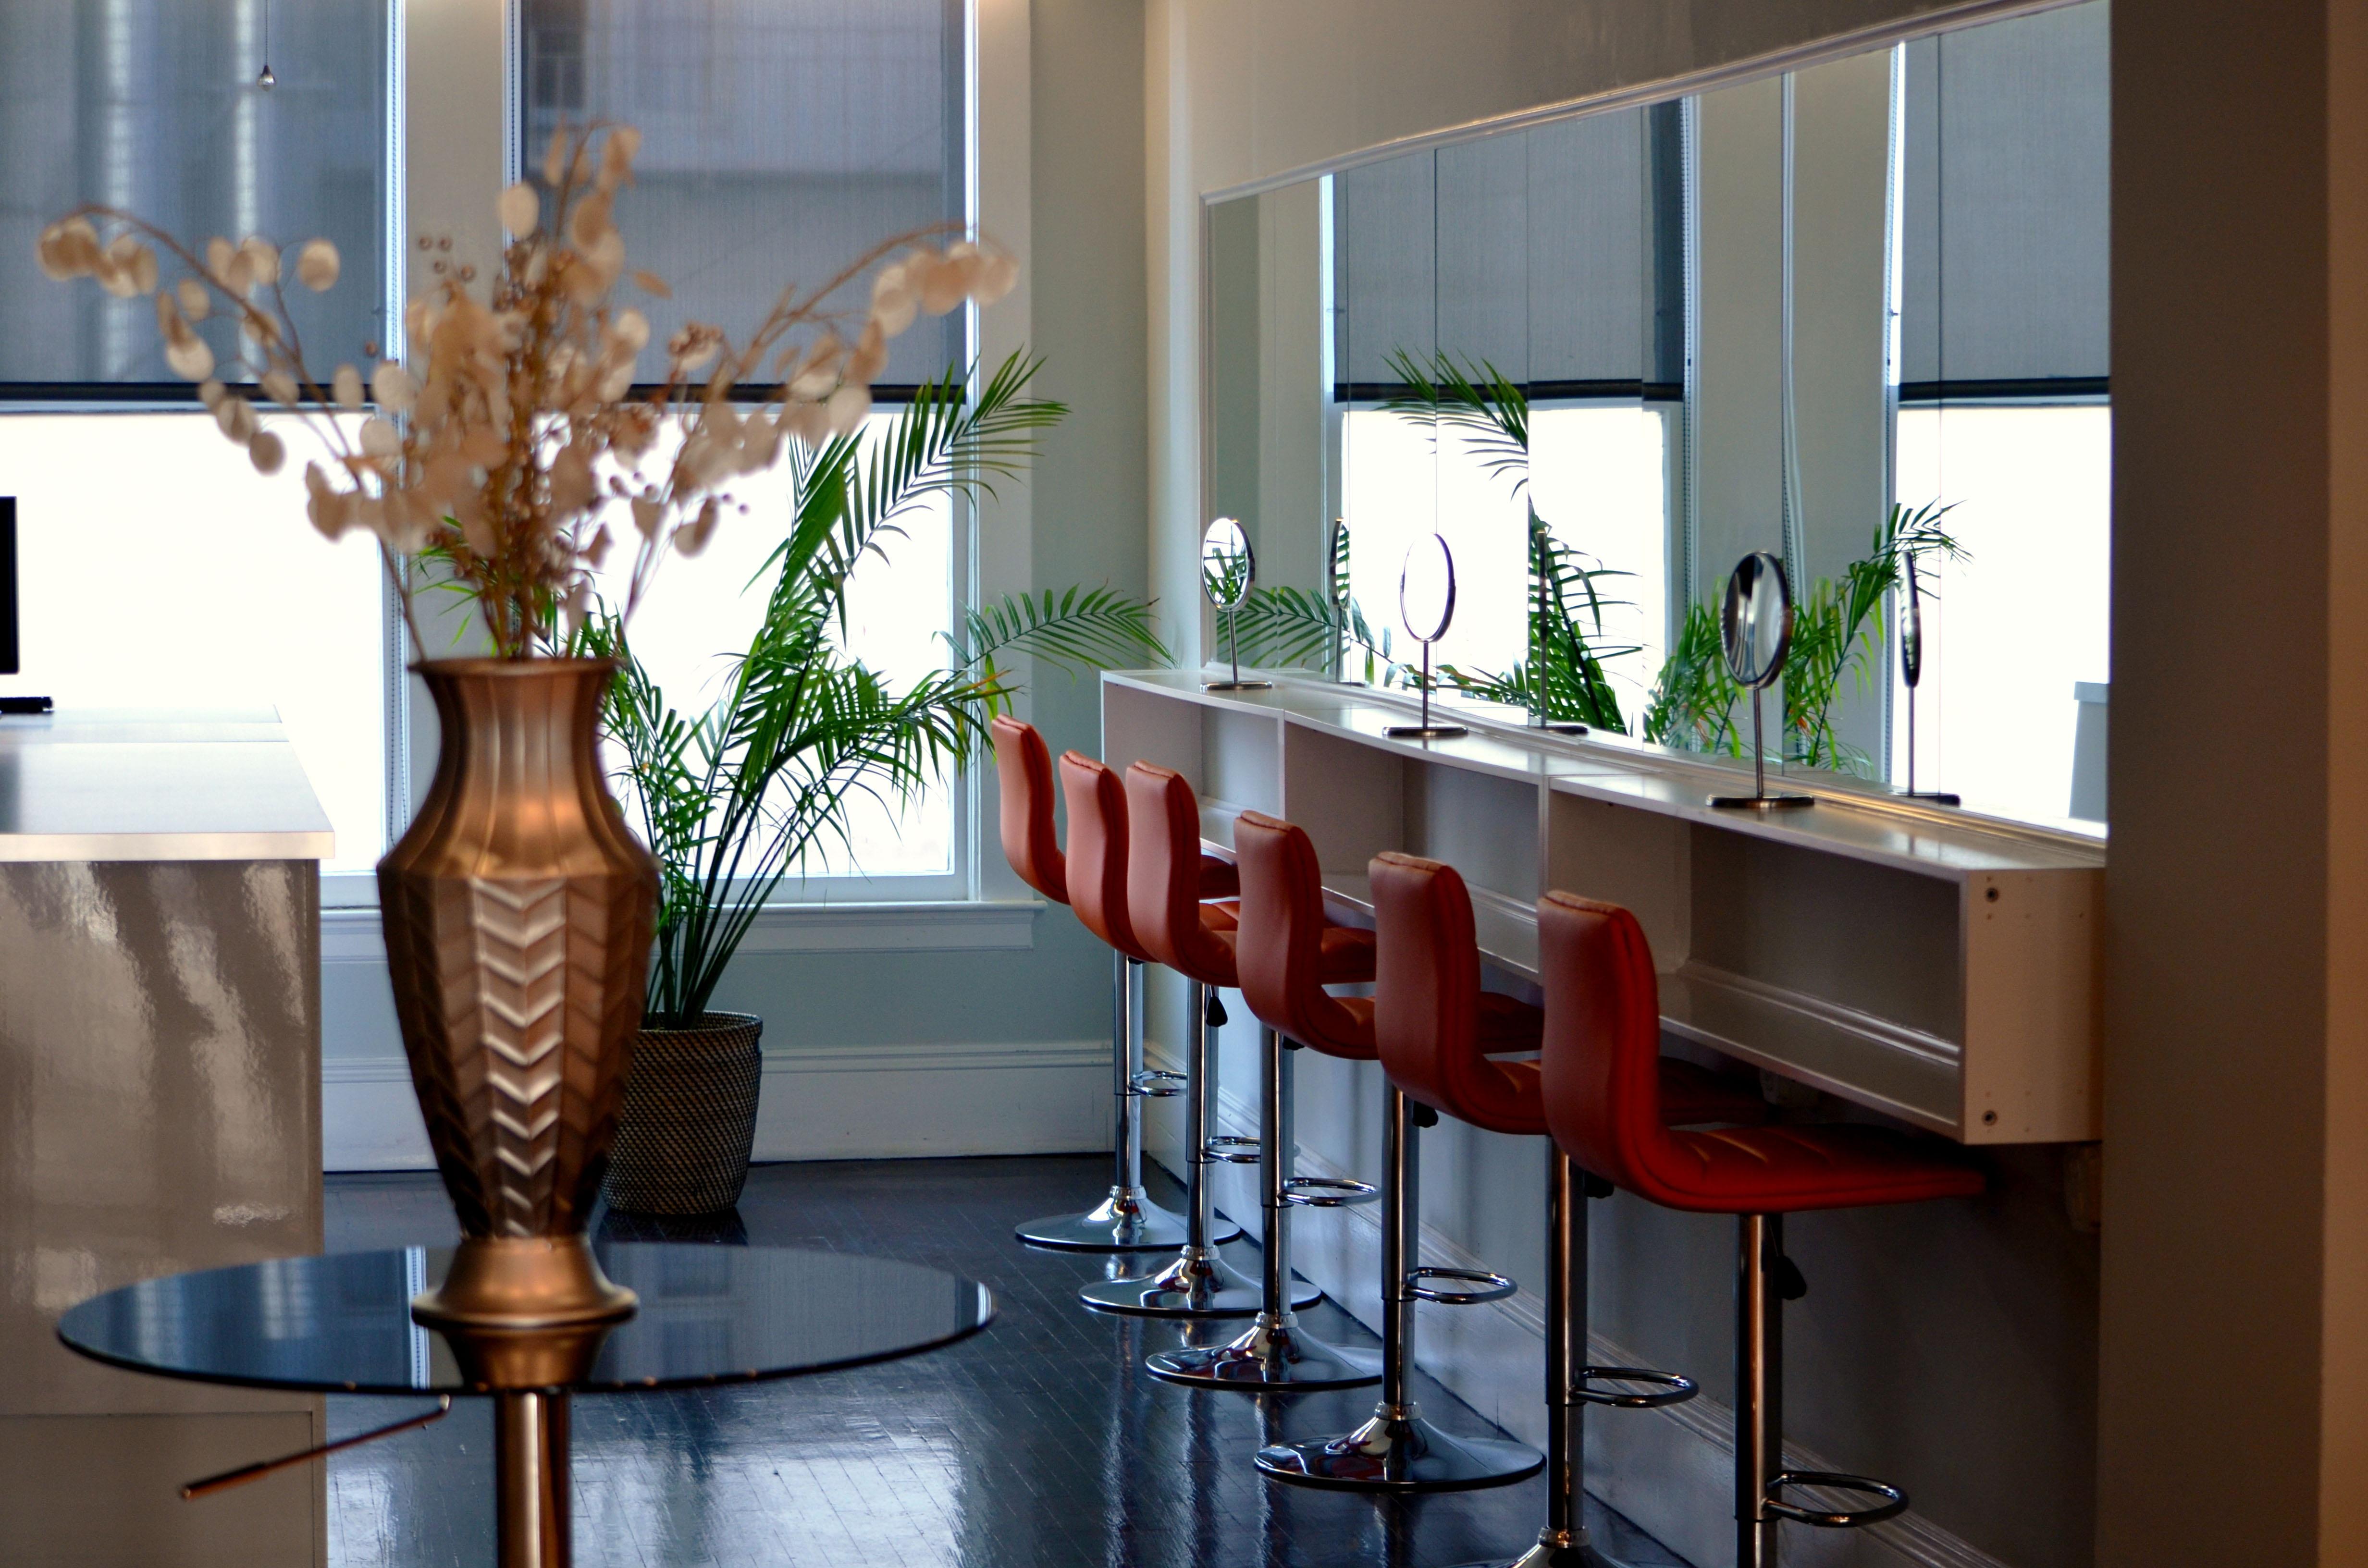 barbershop-4484300